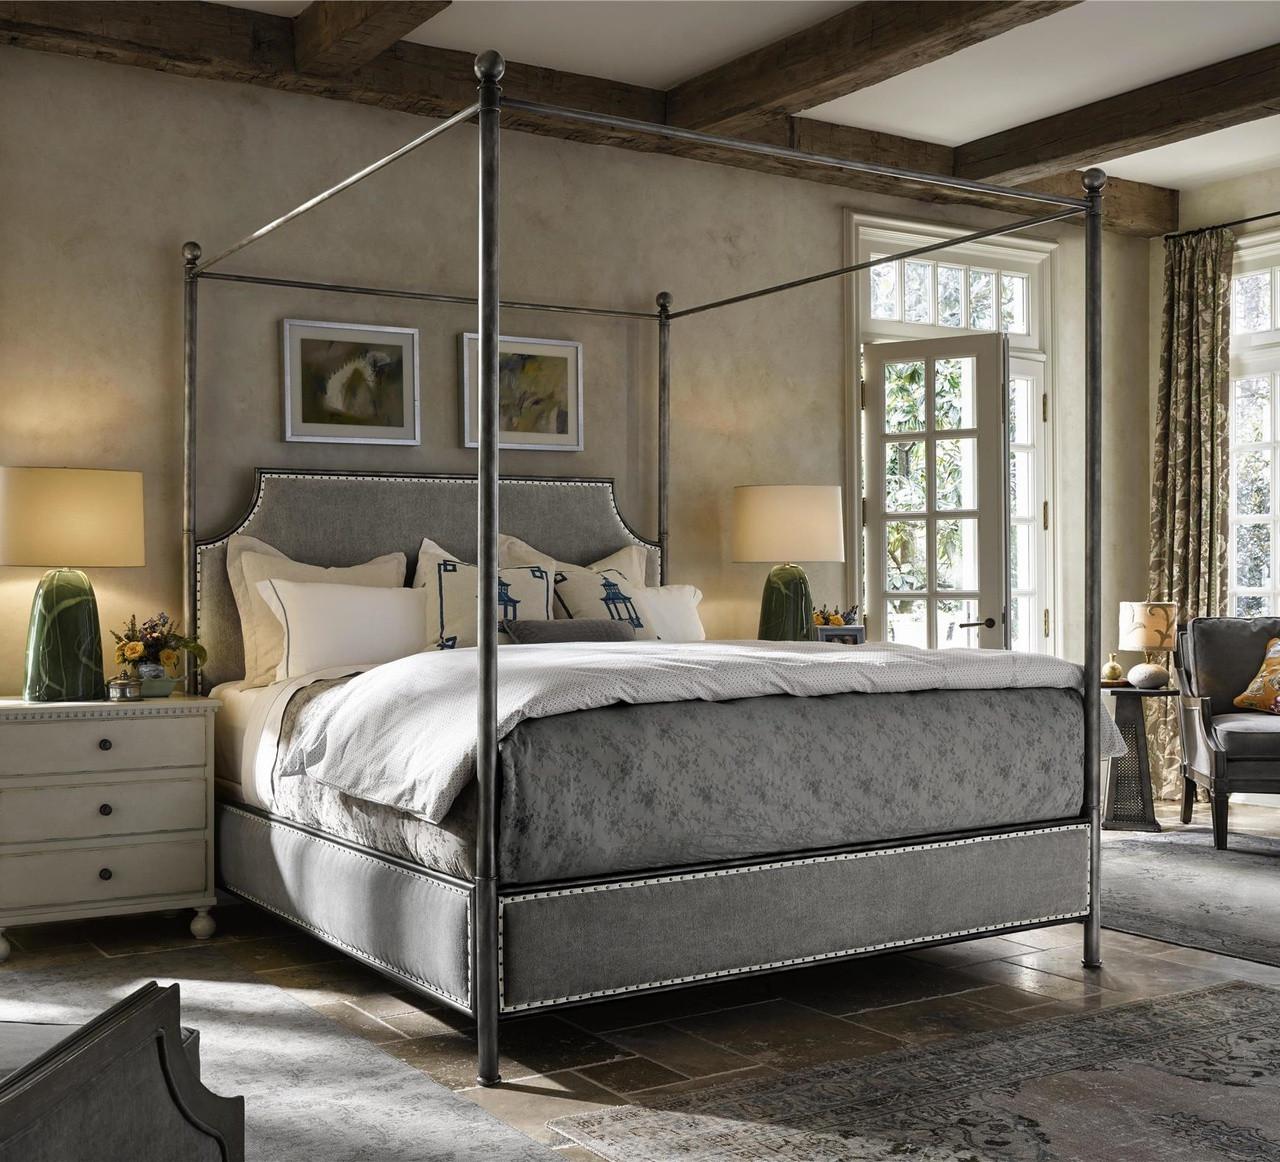 Sojourn Respite Grey Linen Upholstered King Iron Canopy